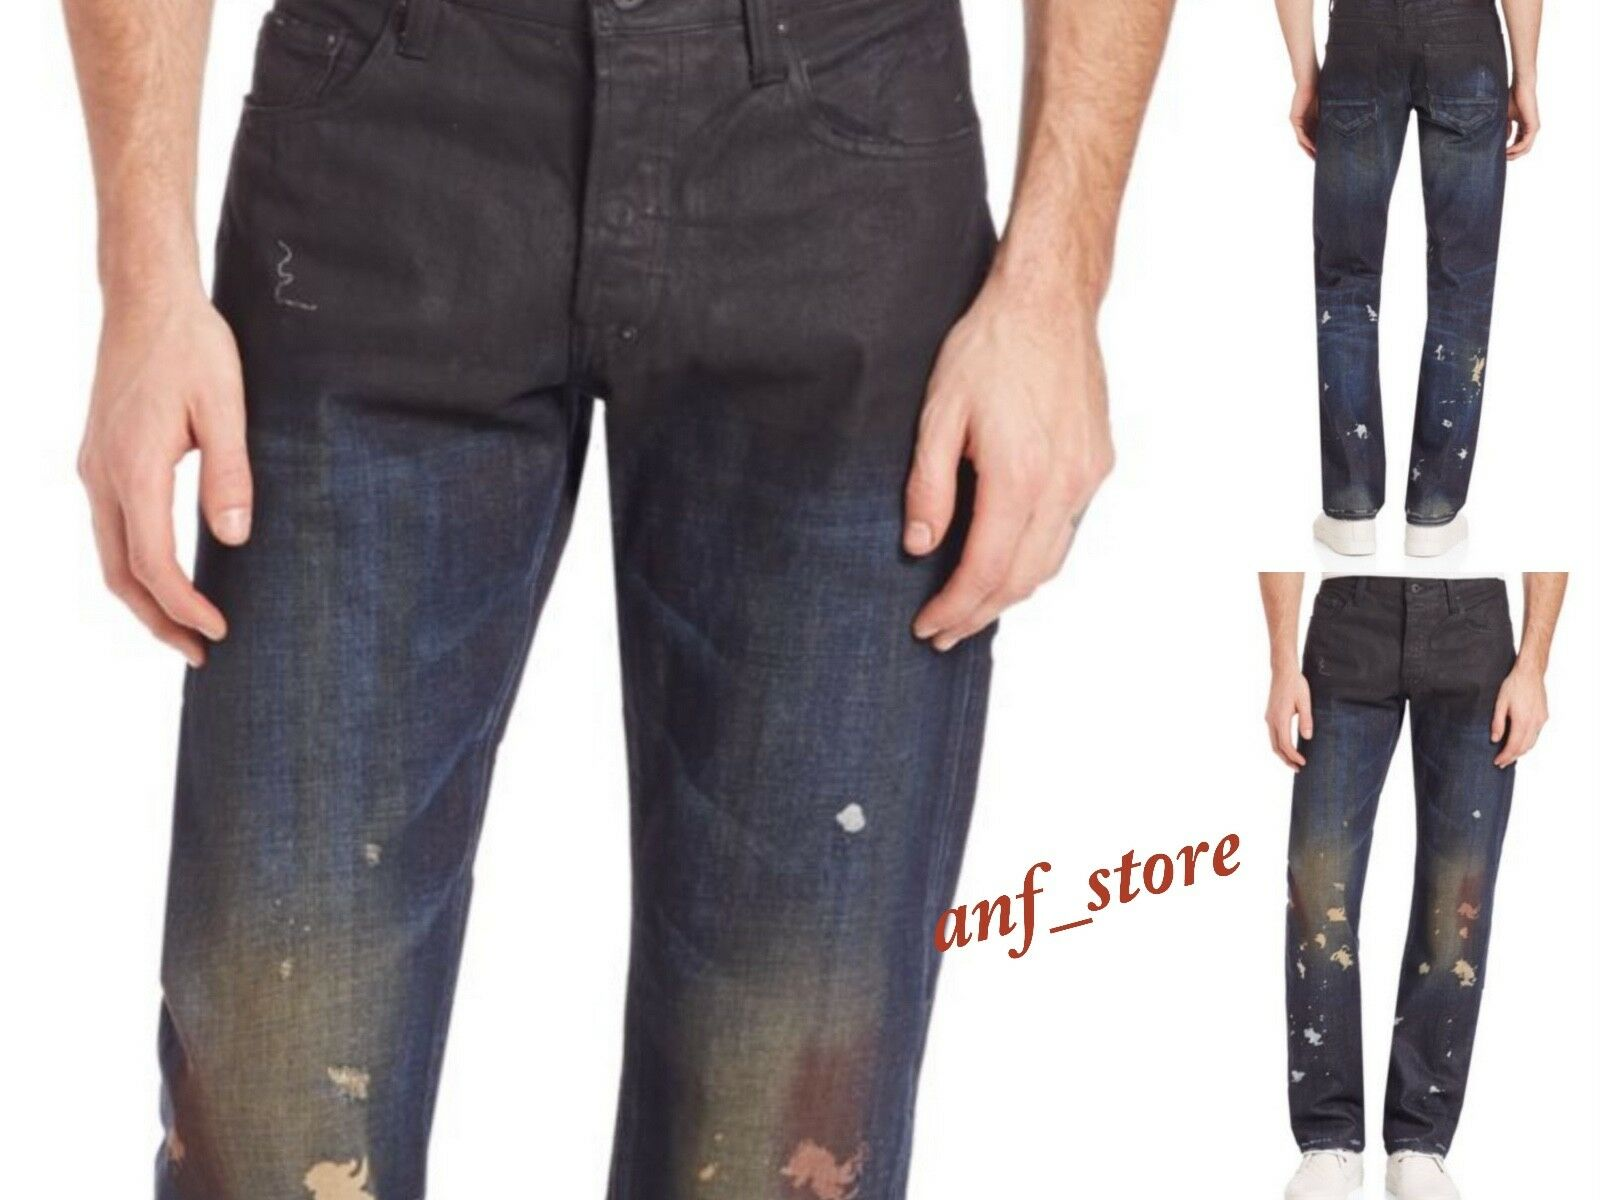 NWT PRPS Goods Co JAPAN Barracuda Straight Men PAINT Splatter Jeans 32 x 32